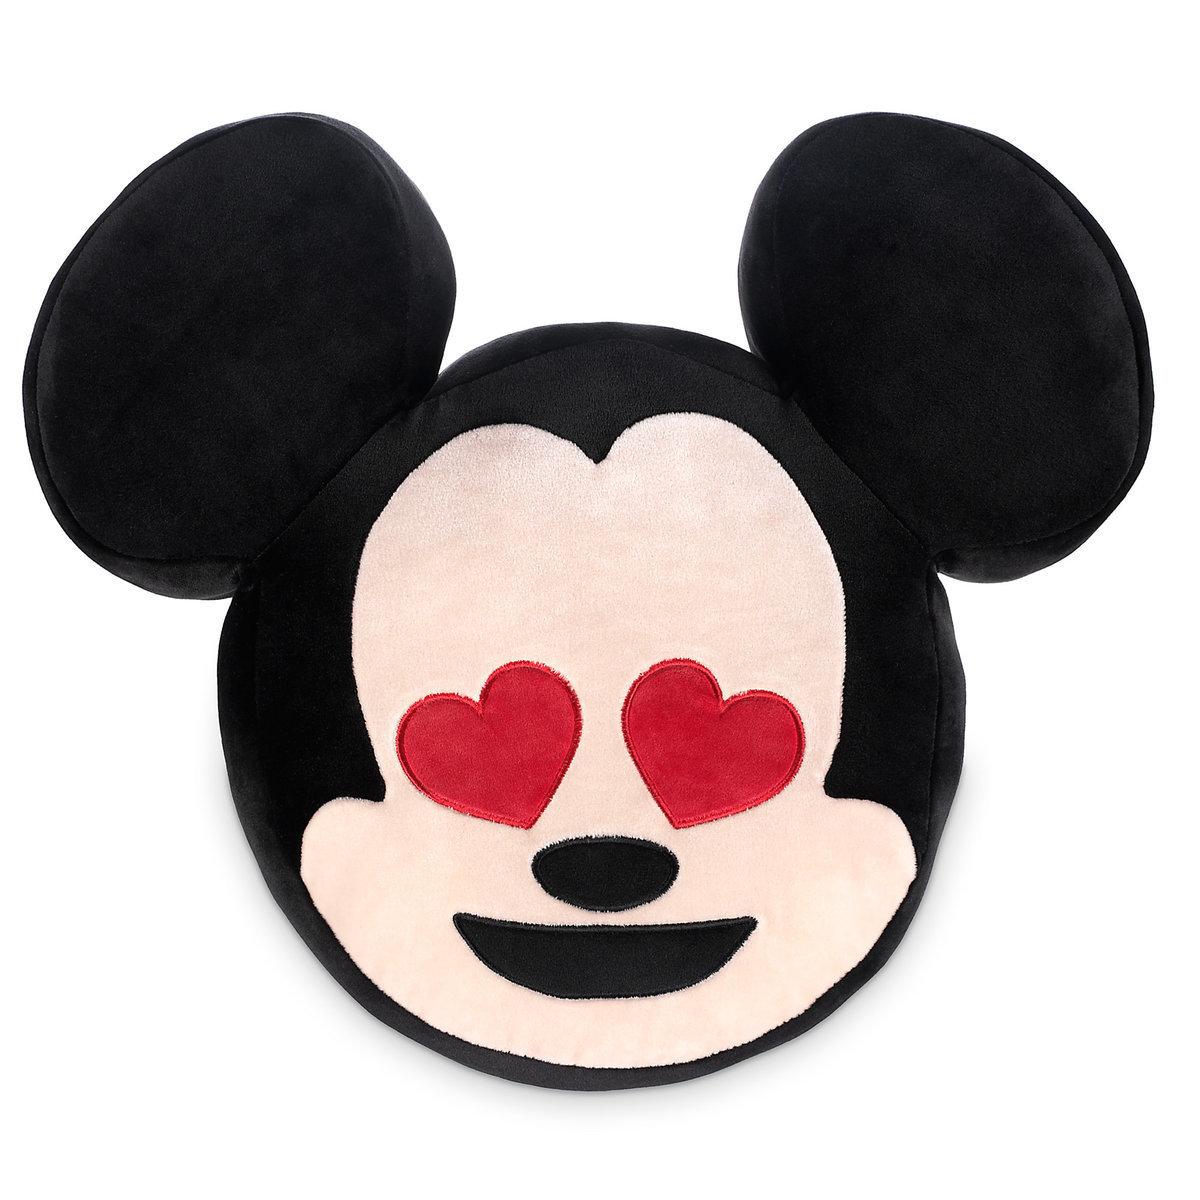 Мягкая подушка «Микки Маус» Дисней